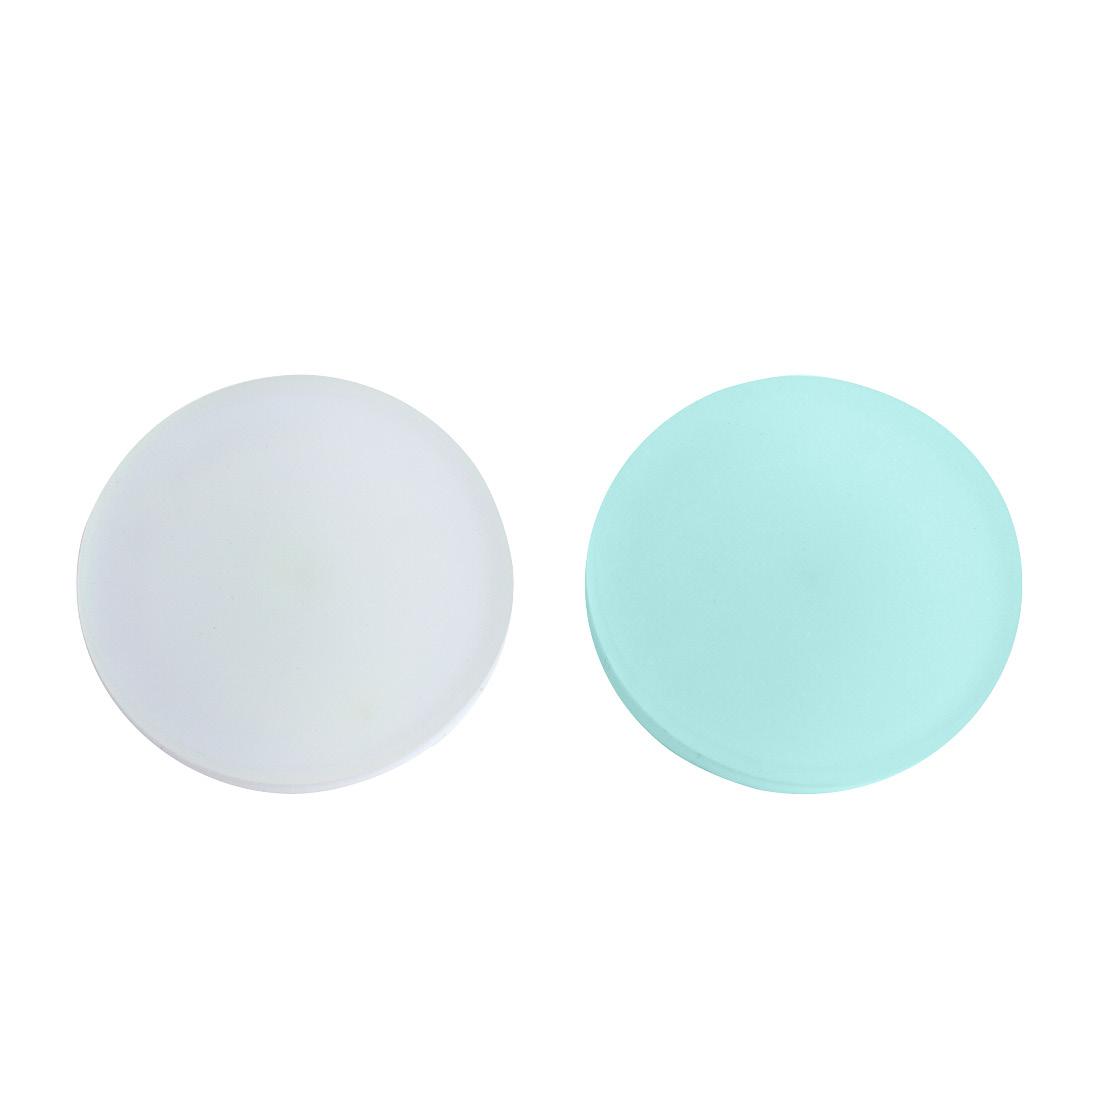 An image of PediCurve PediCrystal Discs